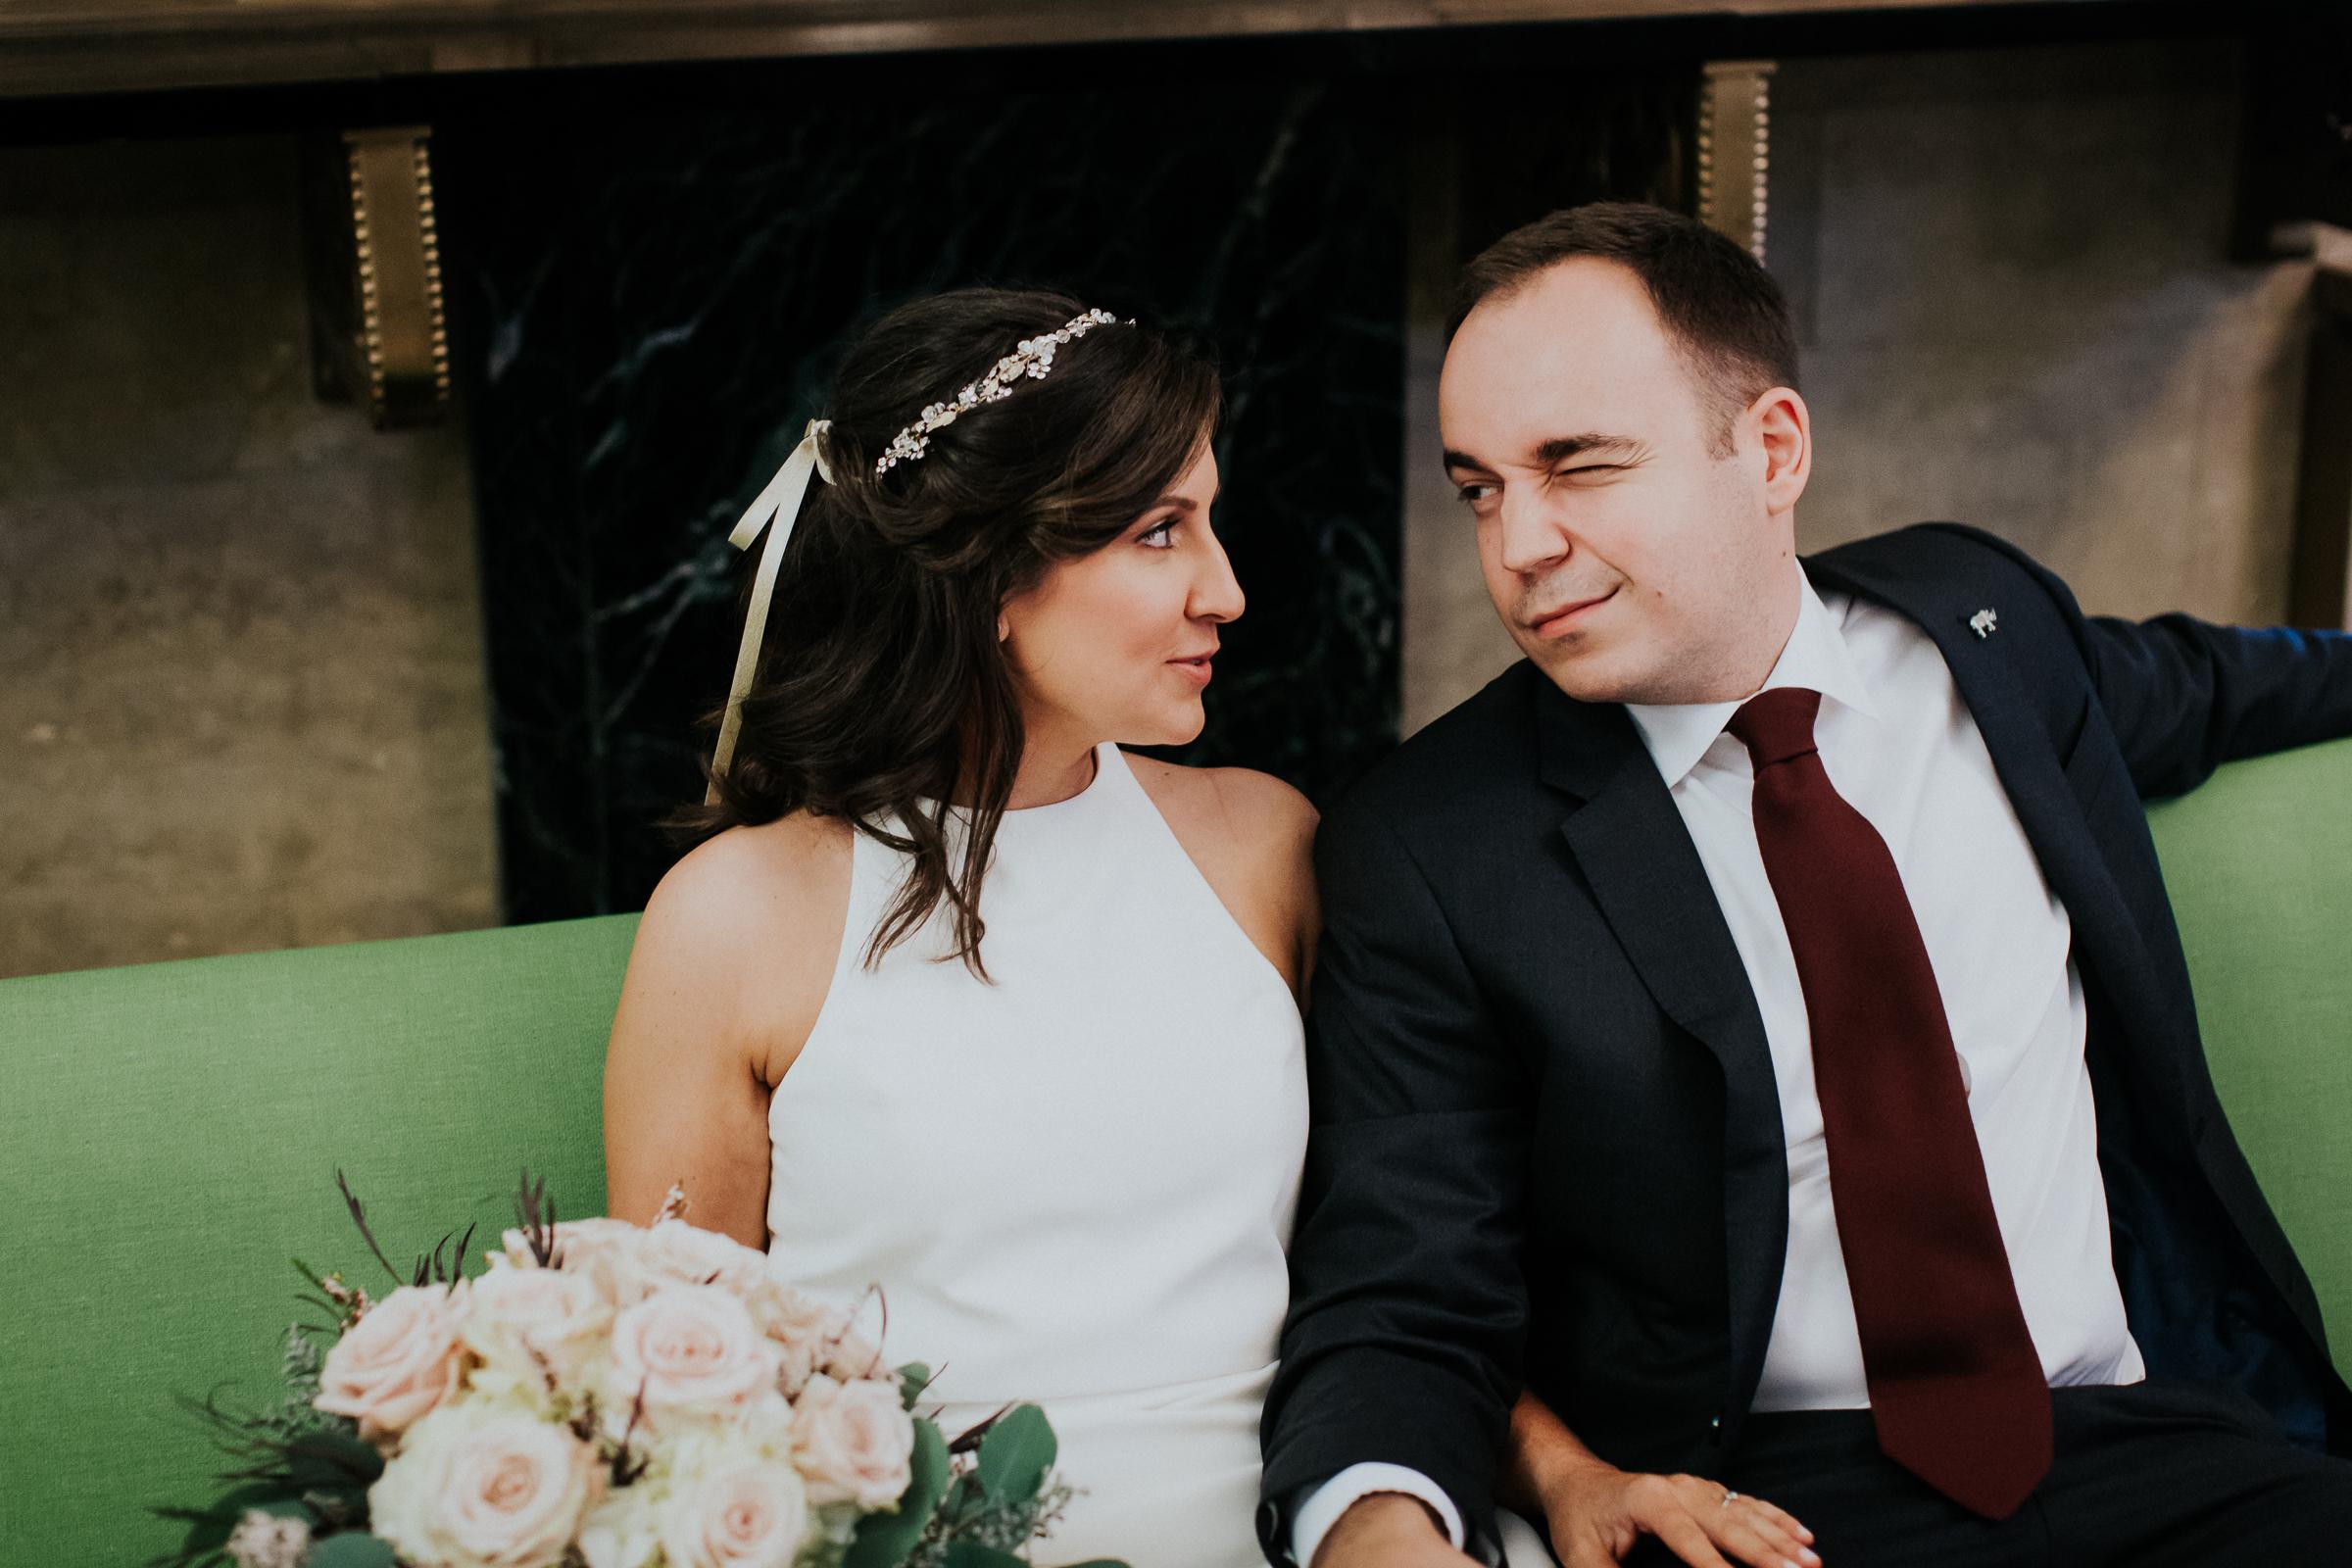 Casa-Apicii-Intimate-Wedding-City-Hall-Elopement-New-York-Documentary-Wedding-Photographer-9.jpg